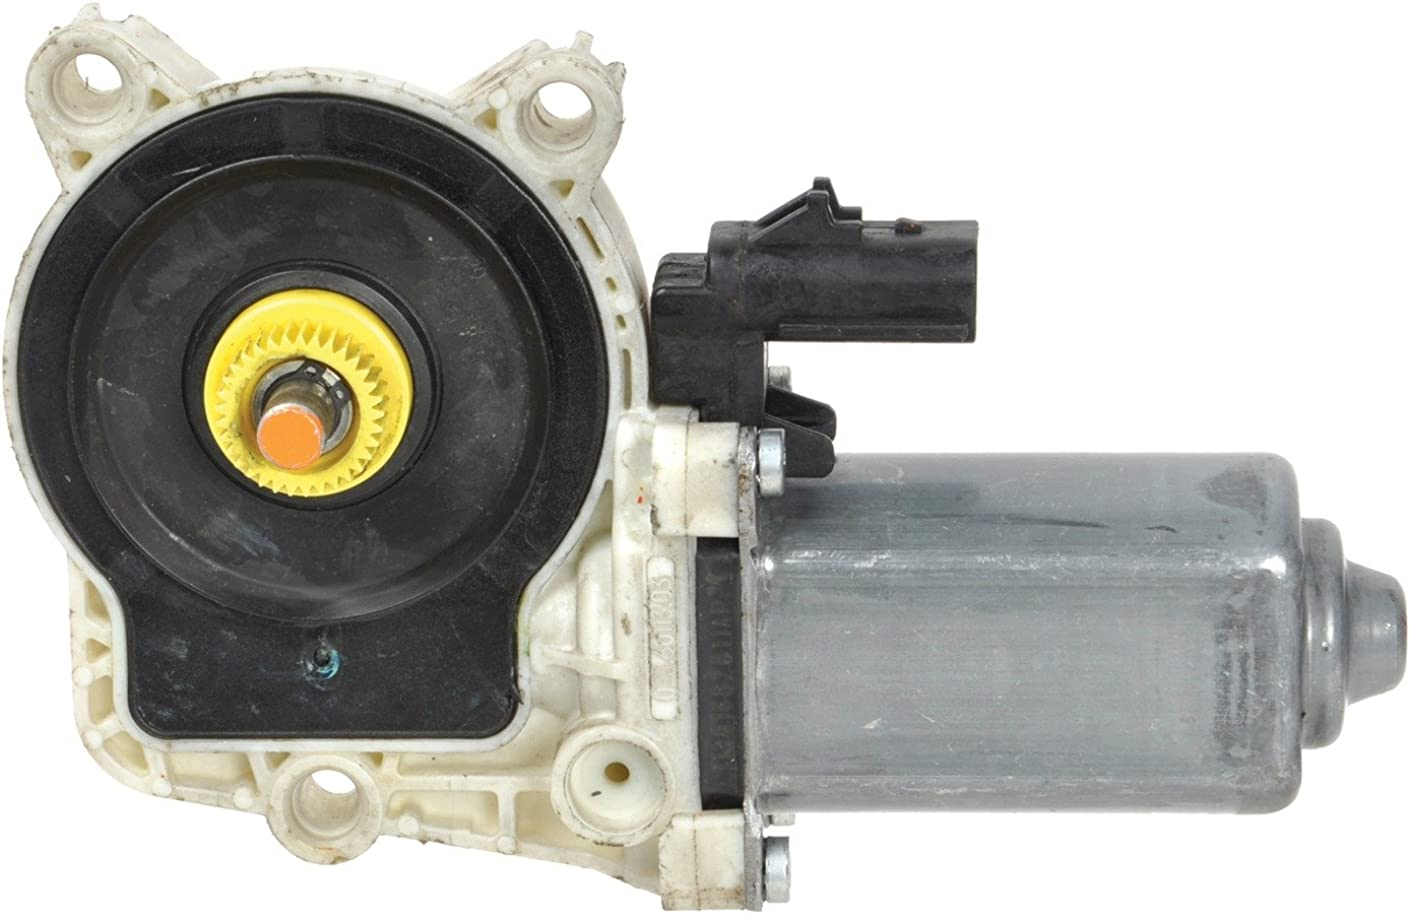 Cardone 42-40026 Remanufactured Domestic Window Lift Motor